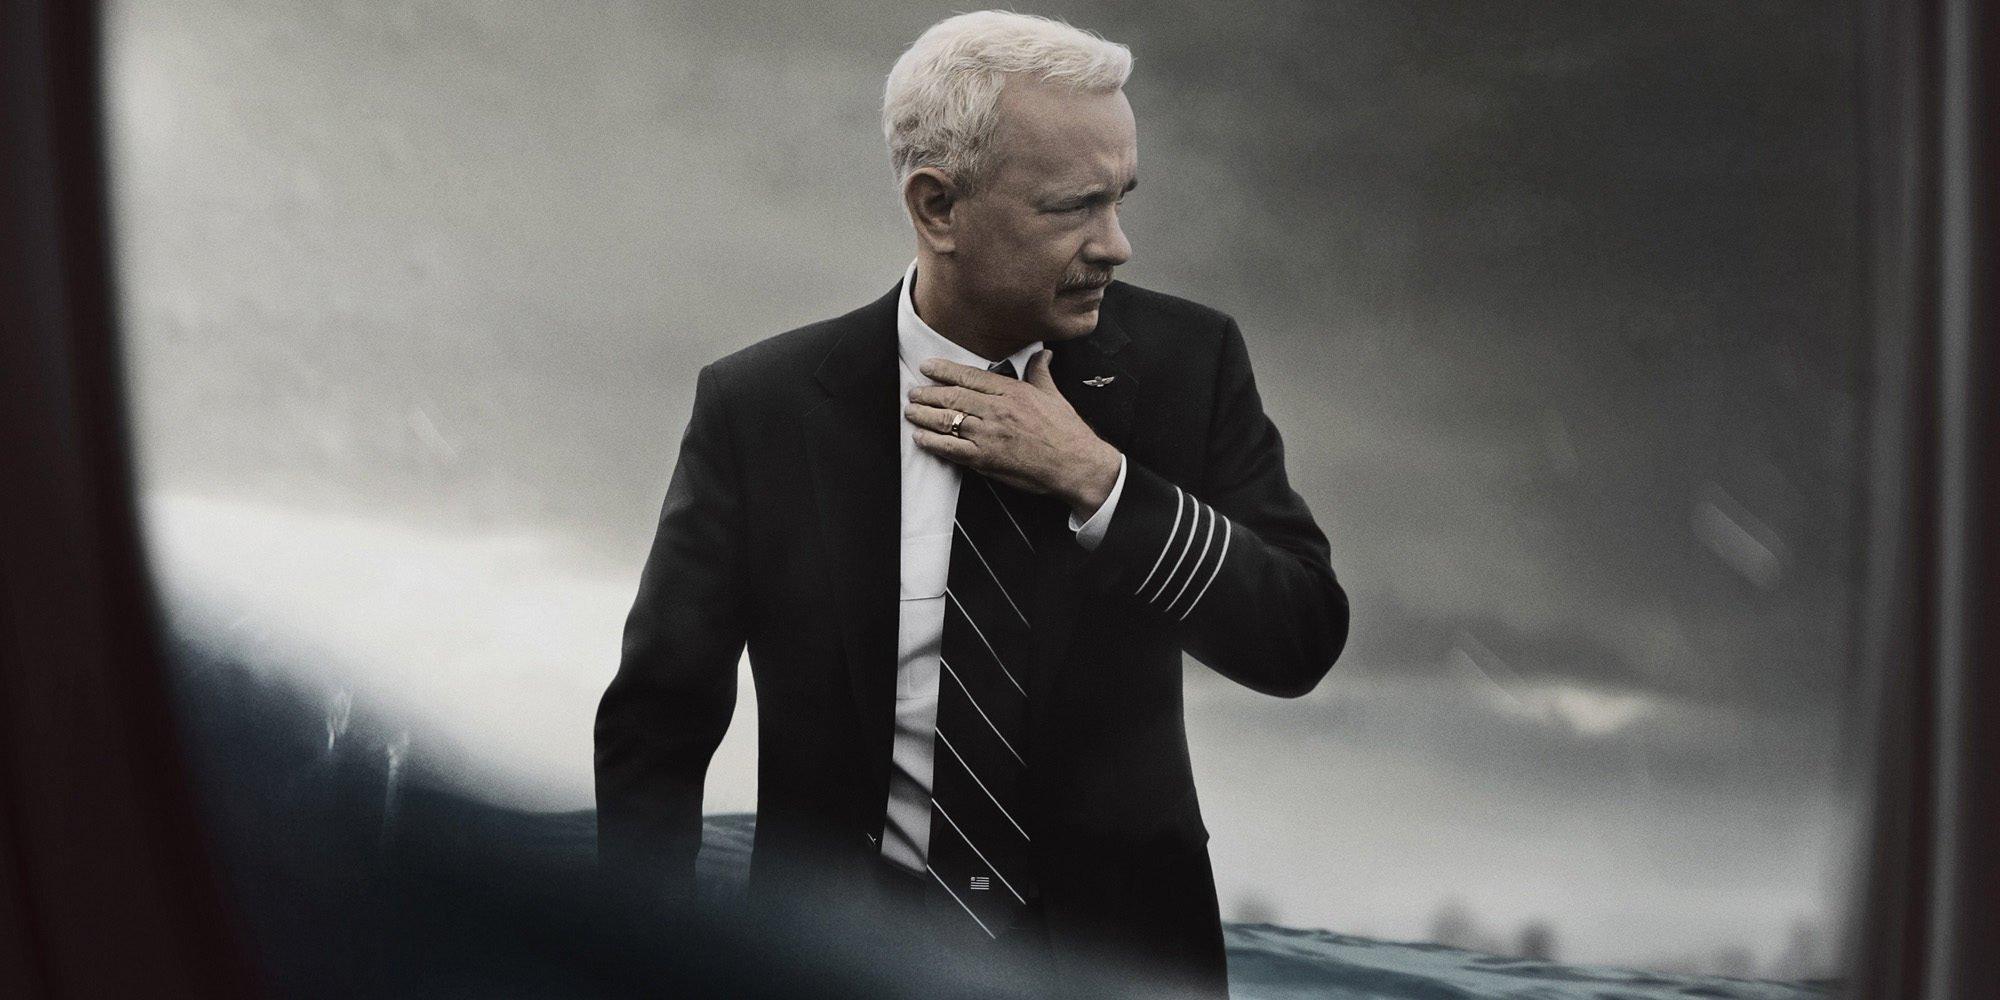 Clint Eastwood dirige a Tom Hanks en la esperada 'Sully'. ¿Repetirán exitazo en España?